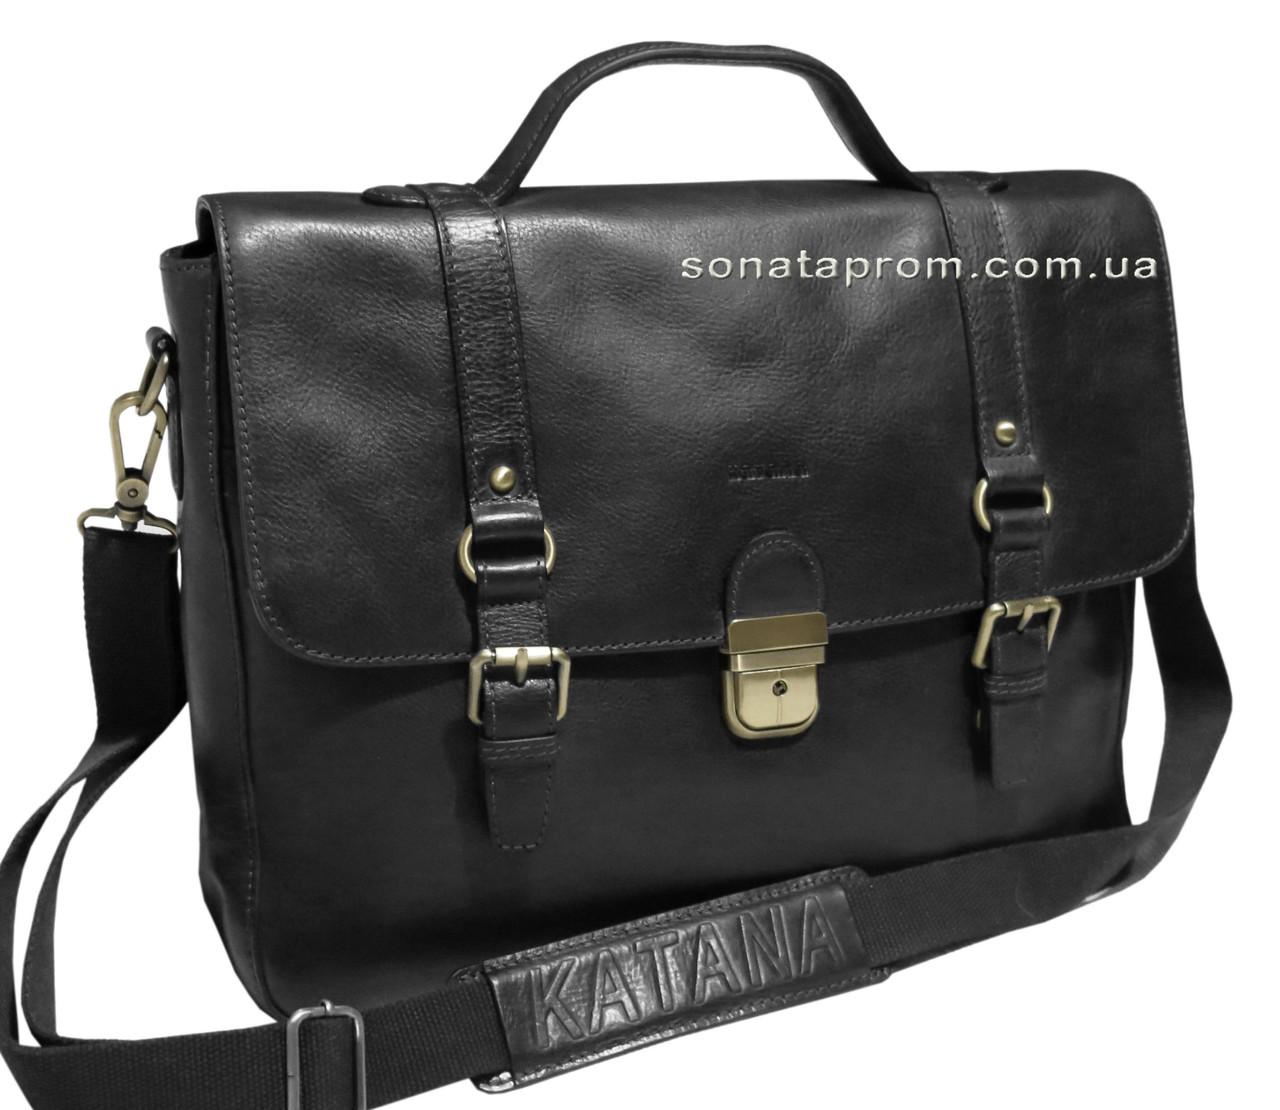 bbf3aeac3be4 Кожаная сумка на плечо Katana Франция, цена 3 599,10 грн., купить в ...